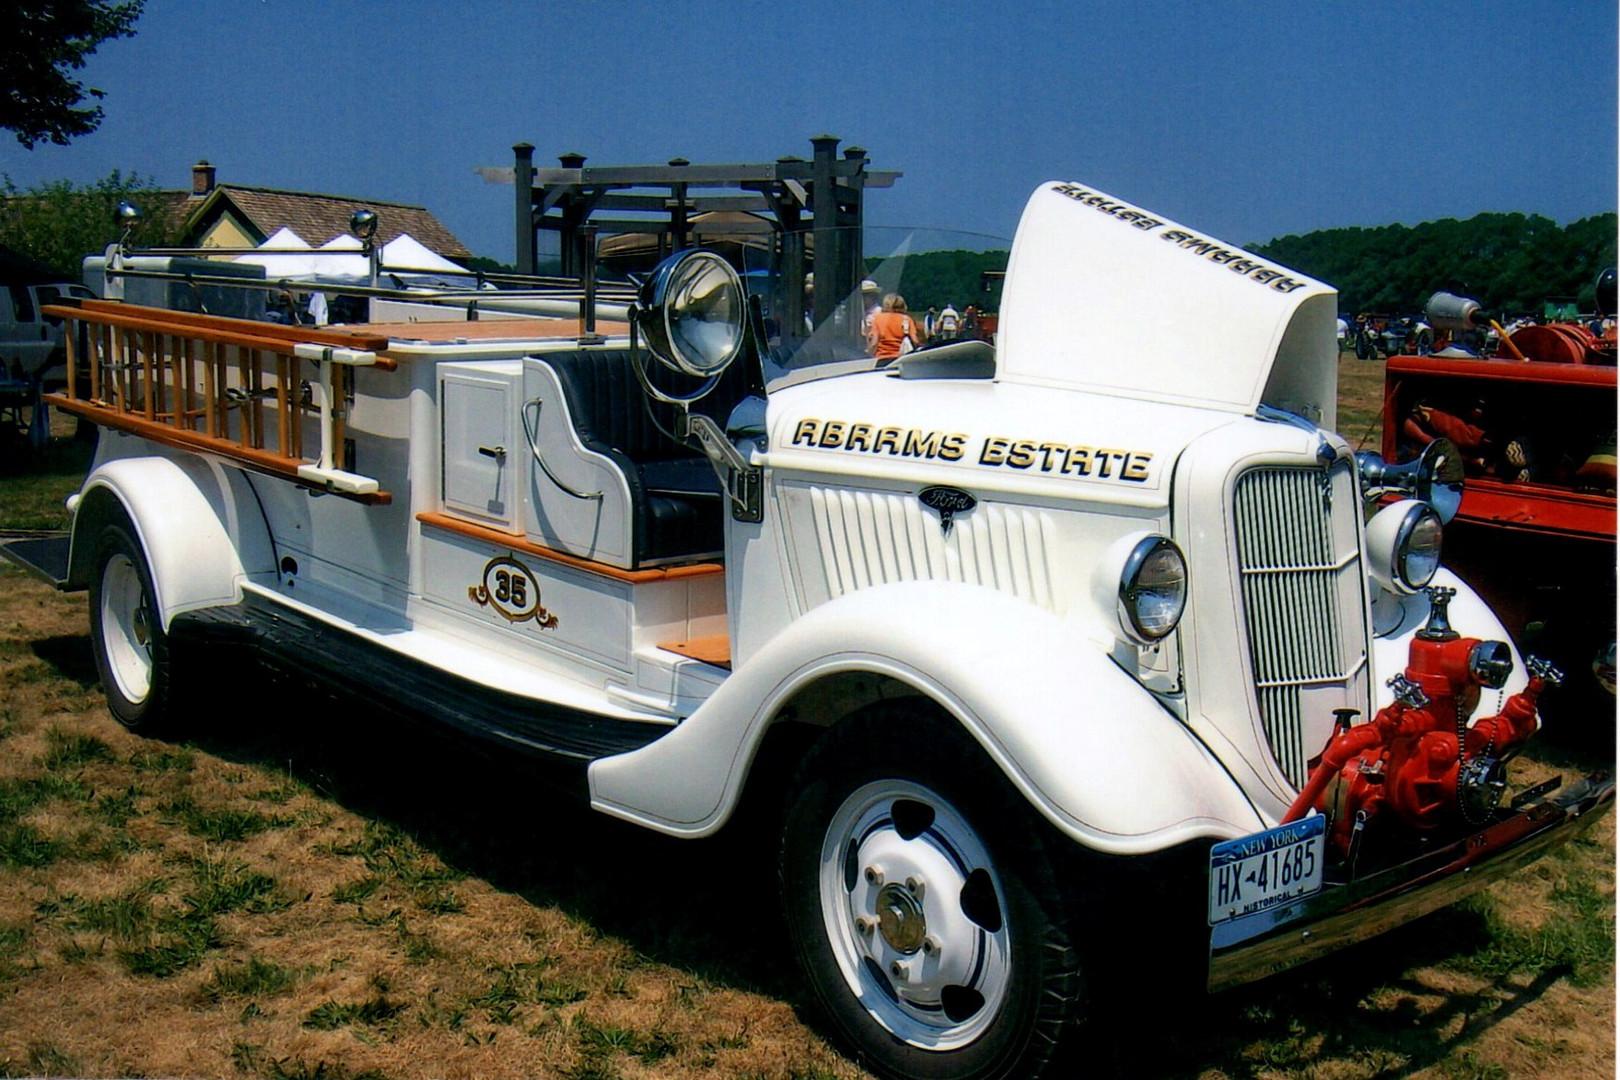 1935 Ford pumper - Floyd Chivvis